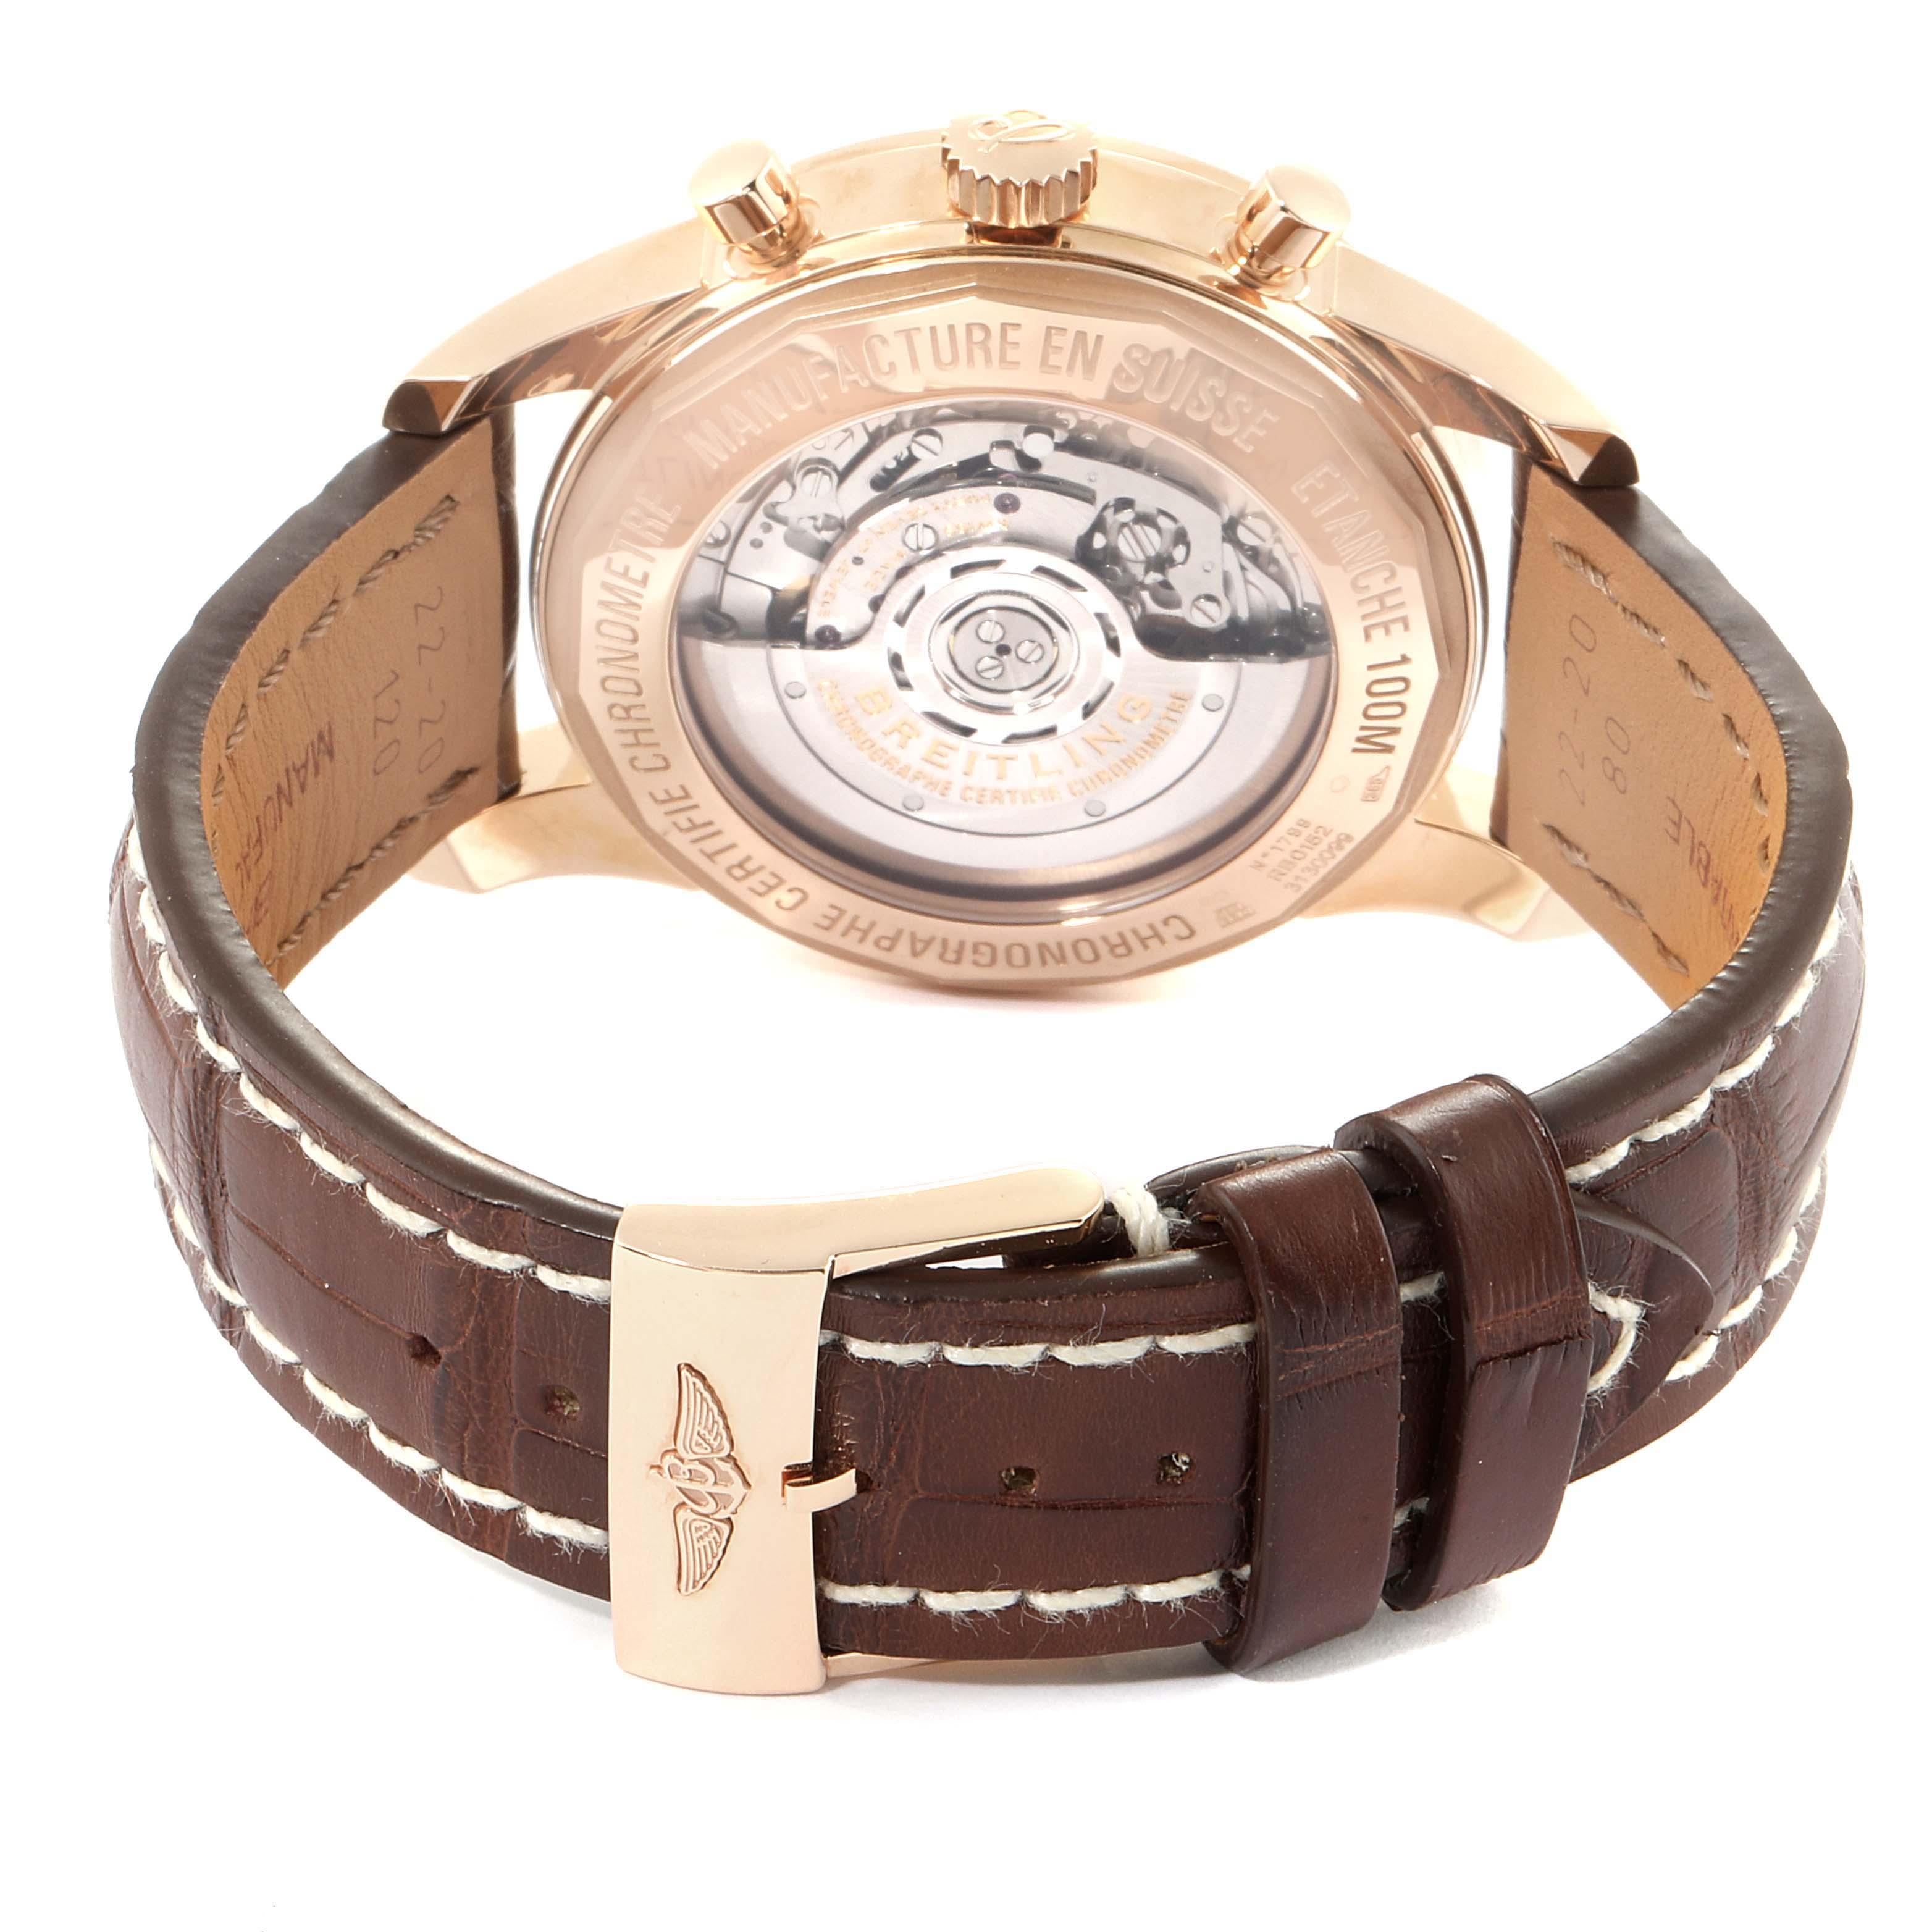 Breitling Transocean 43mm Rose Gold Diamond Mens Watch RB0152 Unworn SwissWatchExpo